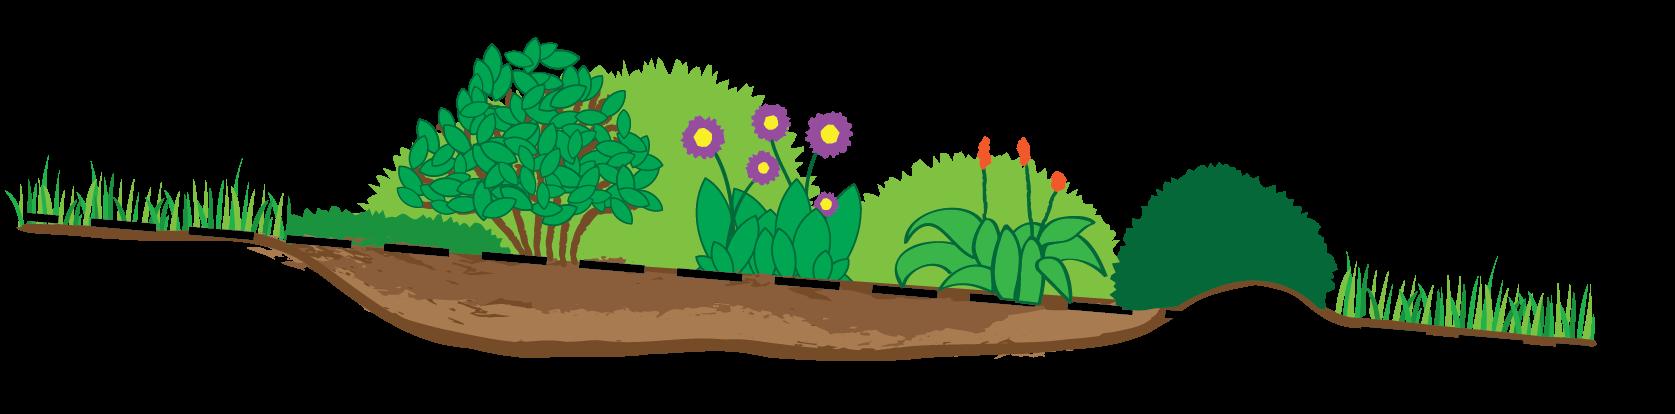 Garden clipart habitat. Rain clean foundation